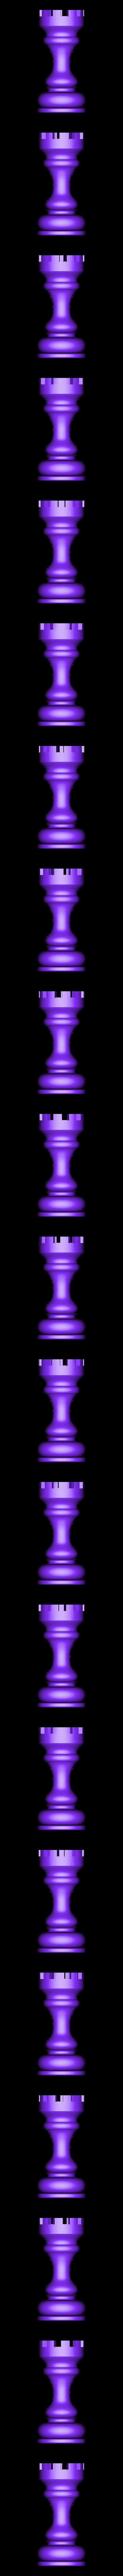 Rook.STL Download free STL file Chess set / Chess set • 3D printable model, OC3D